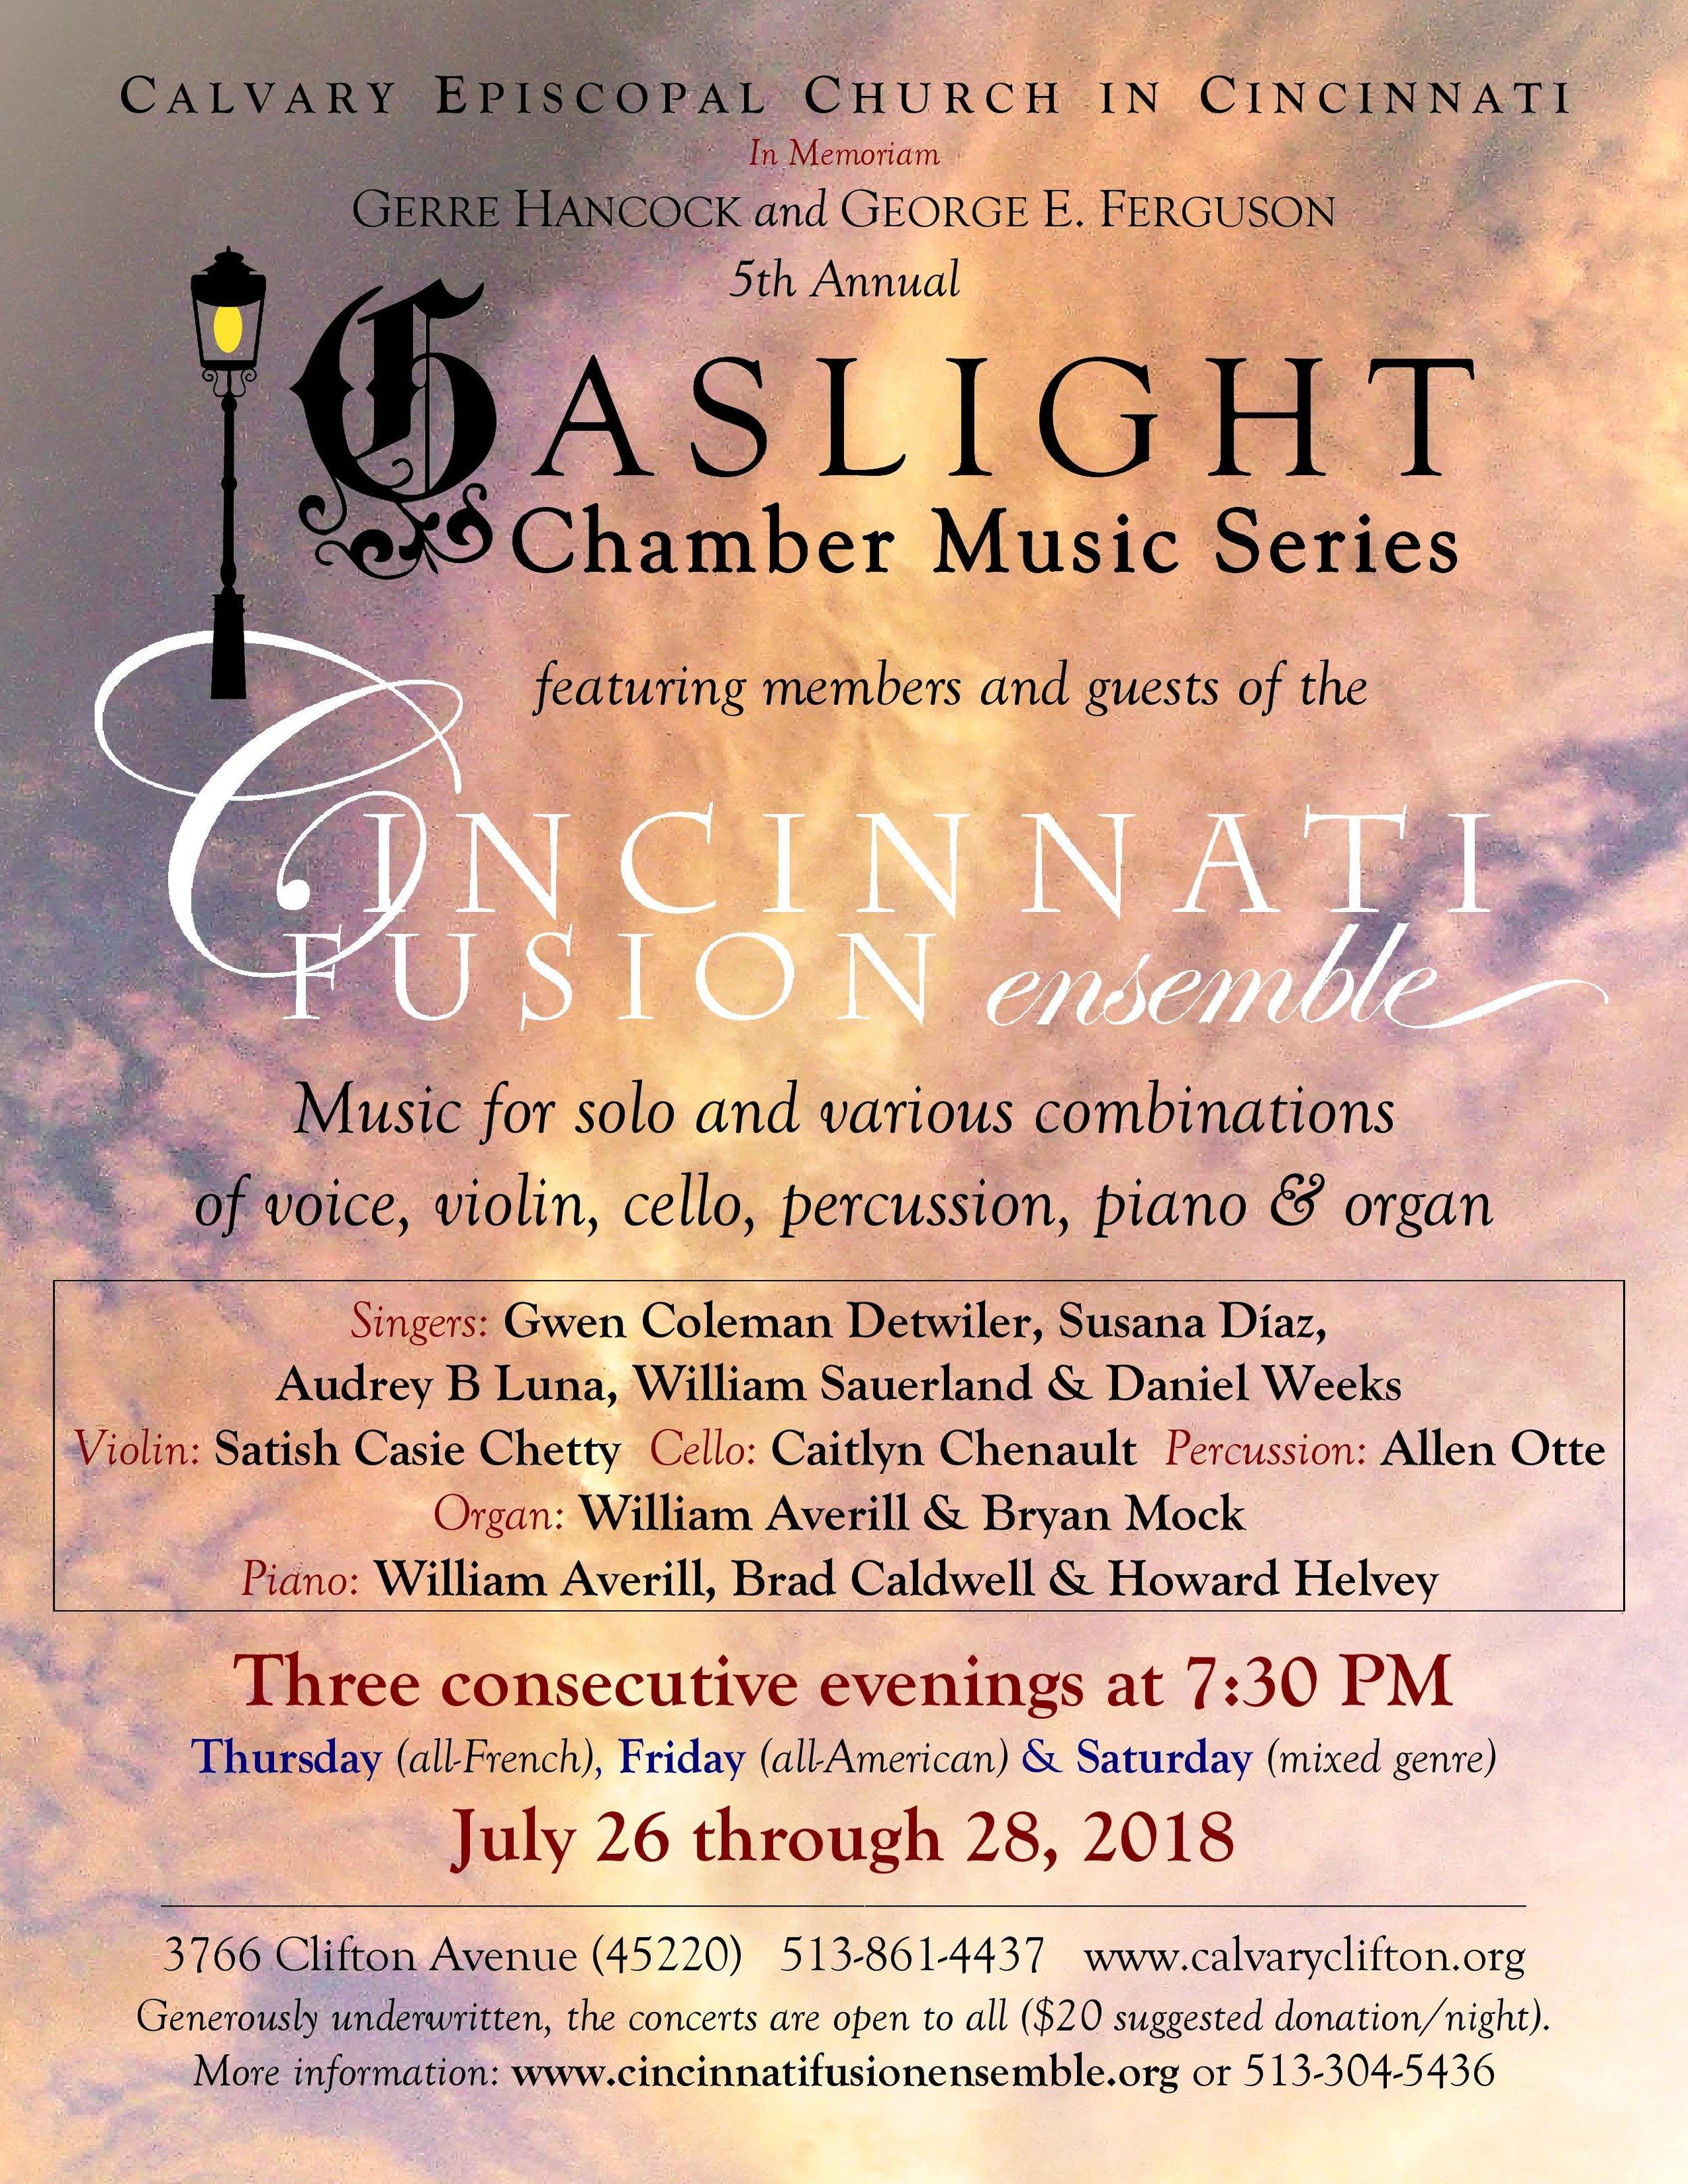 Gaslight Chamber Music Series 2018 POSTER.jpg